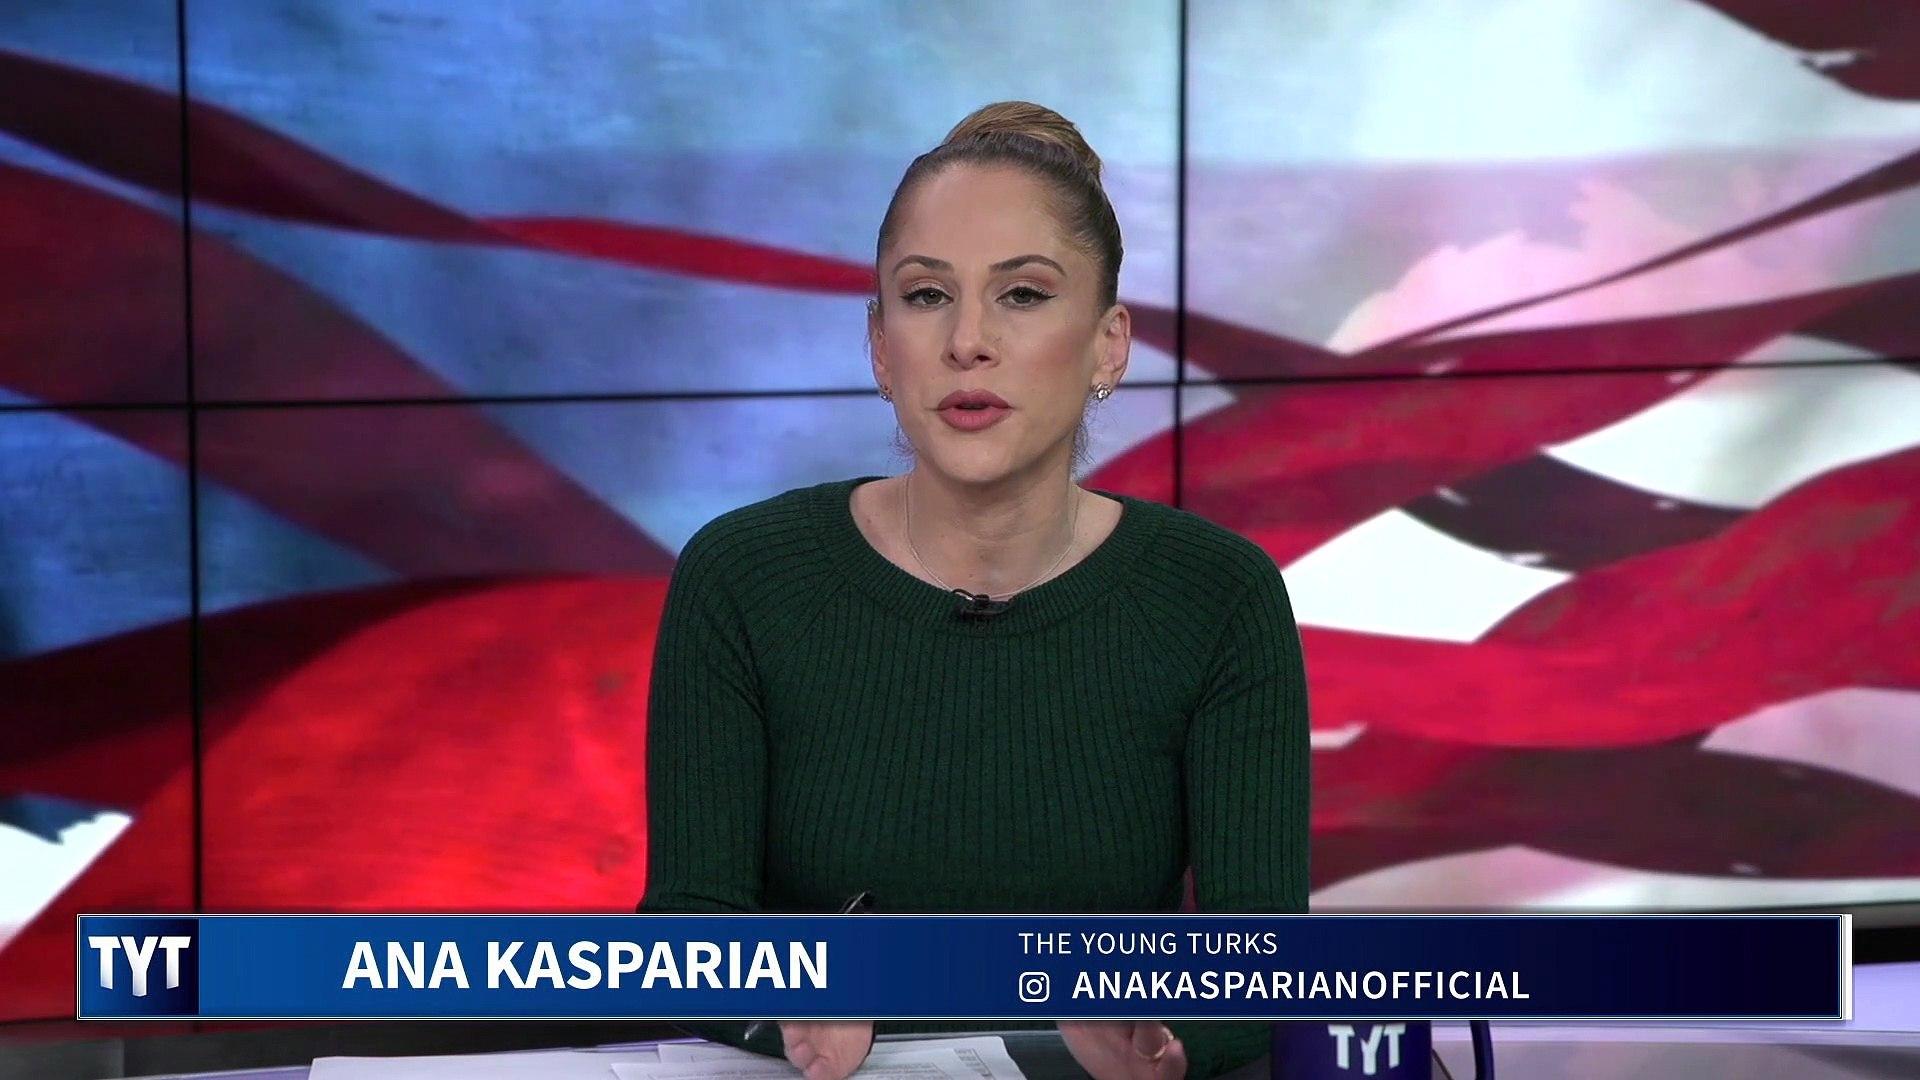 Ana Kasparian Nose Job ana kasparian - video: ana kasparian interviews tyt